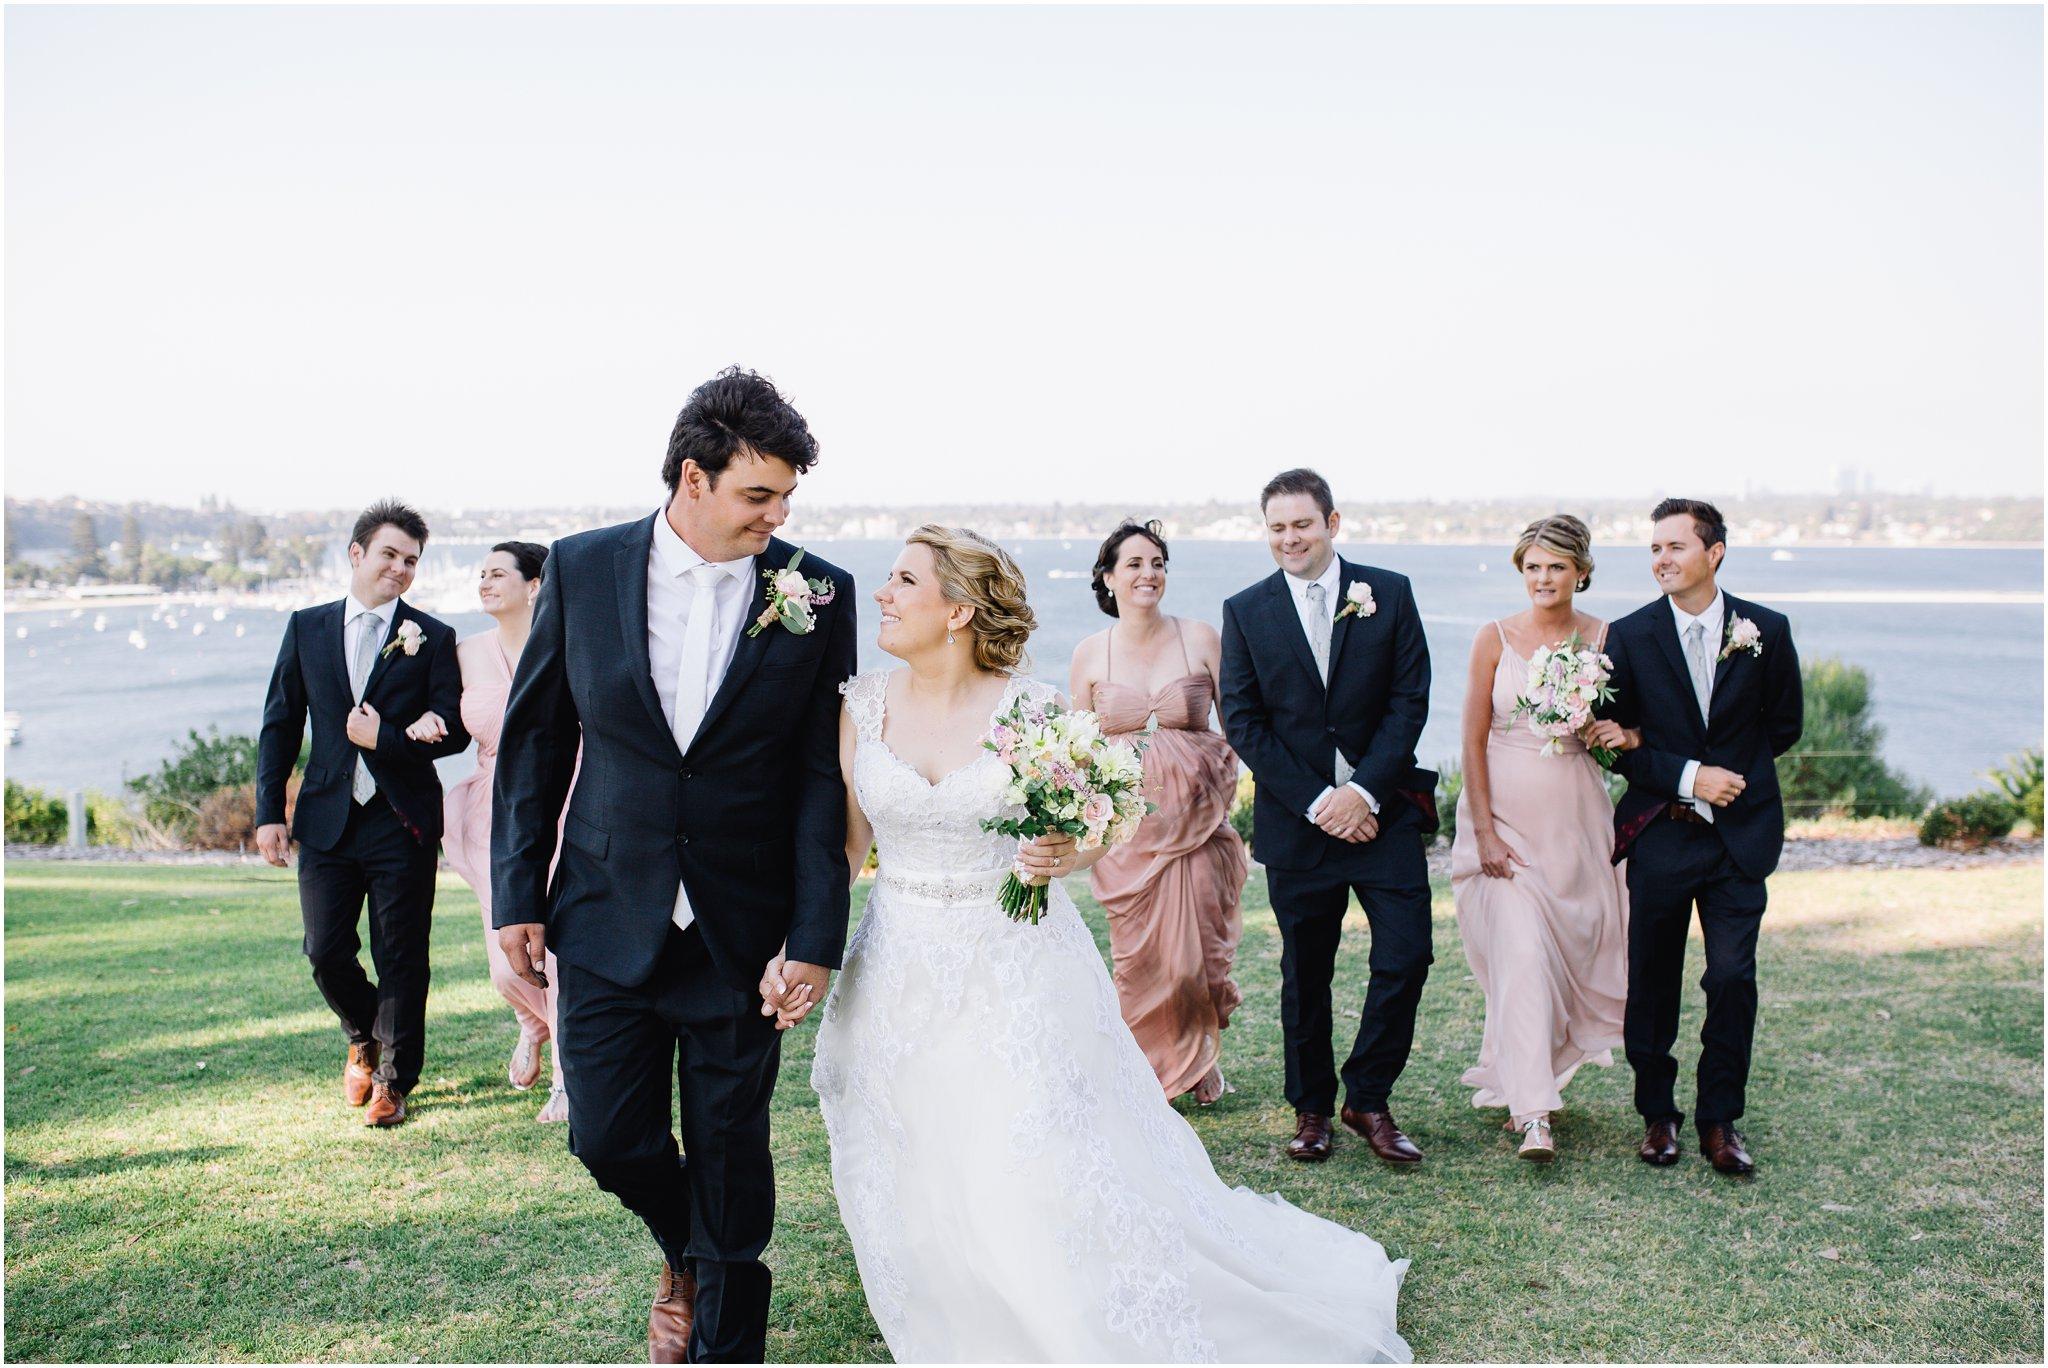 perth_wedding_photographer-liz-jorquera.jpg